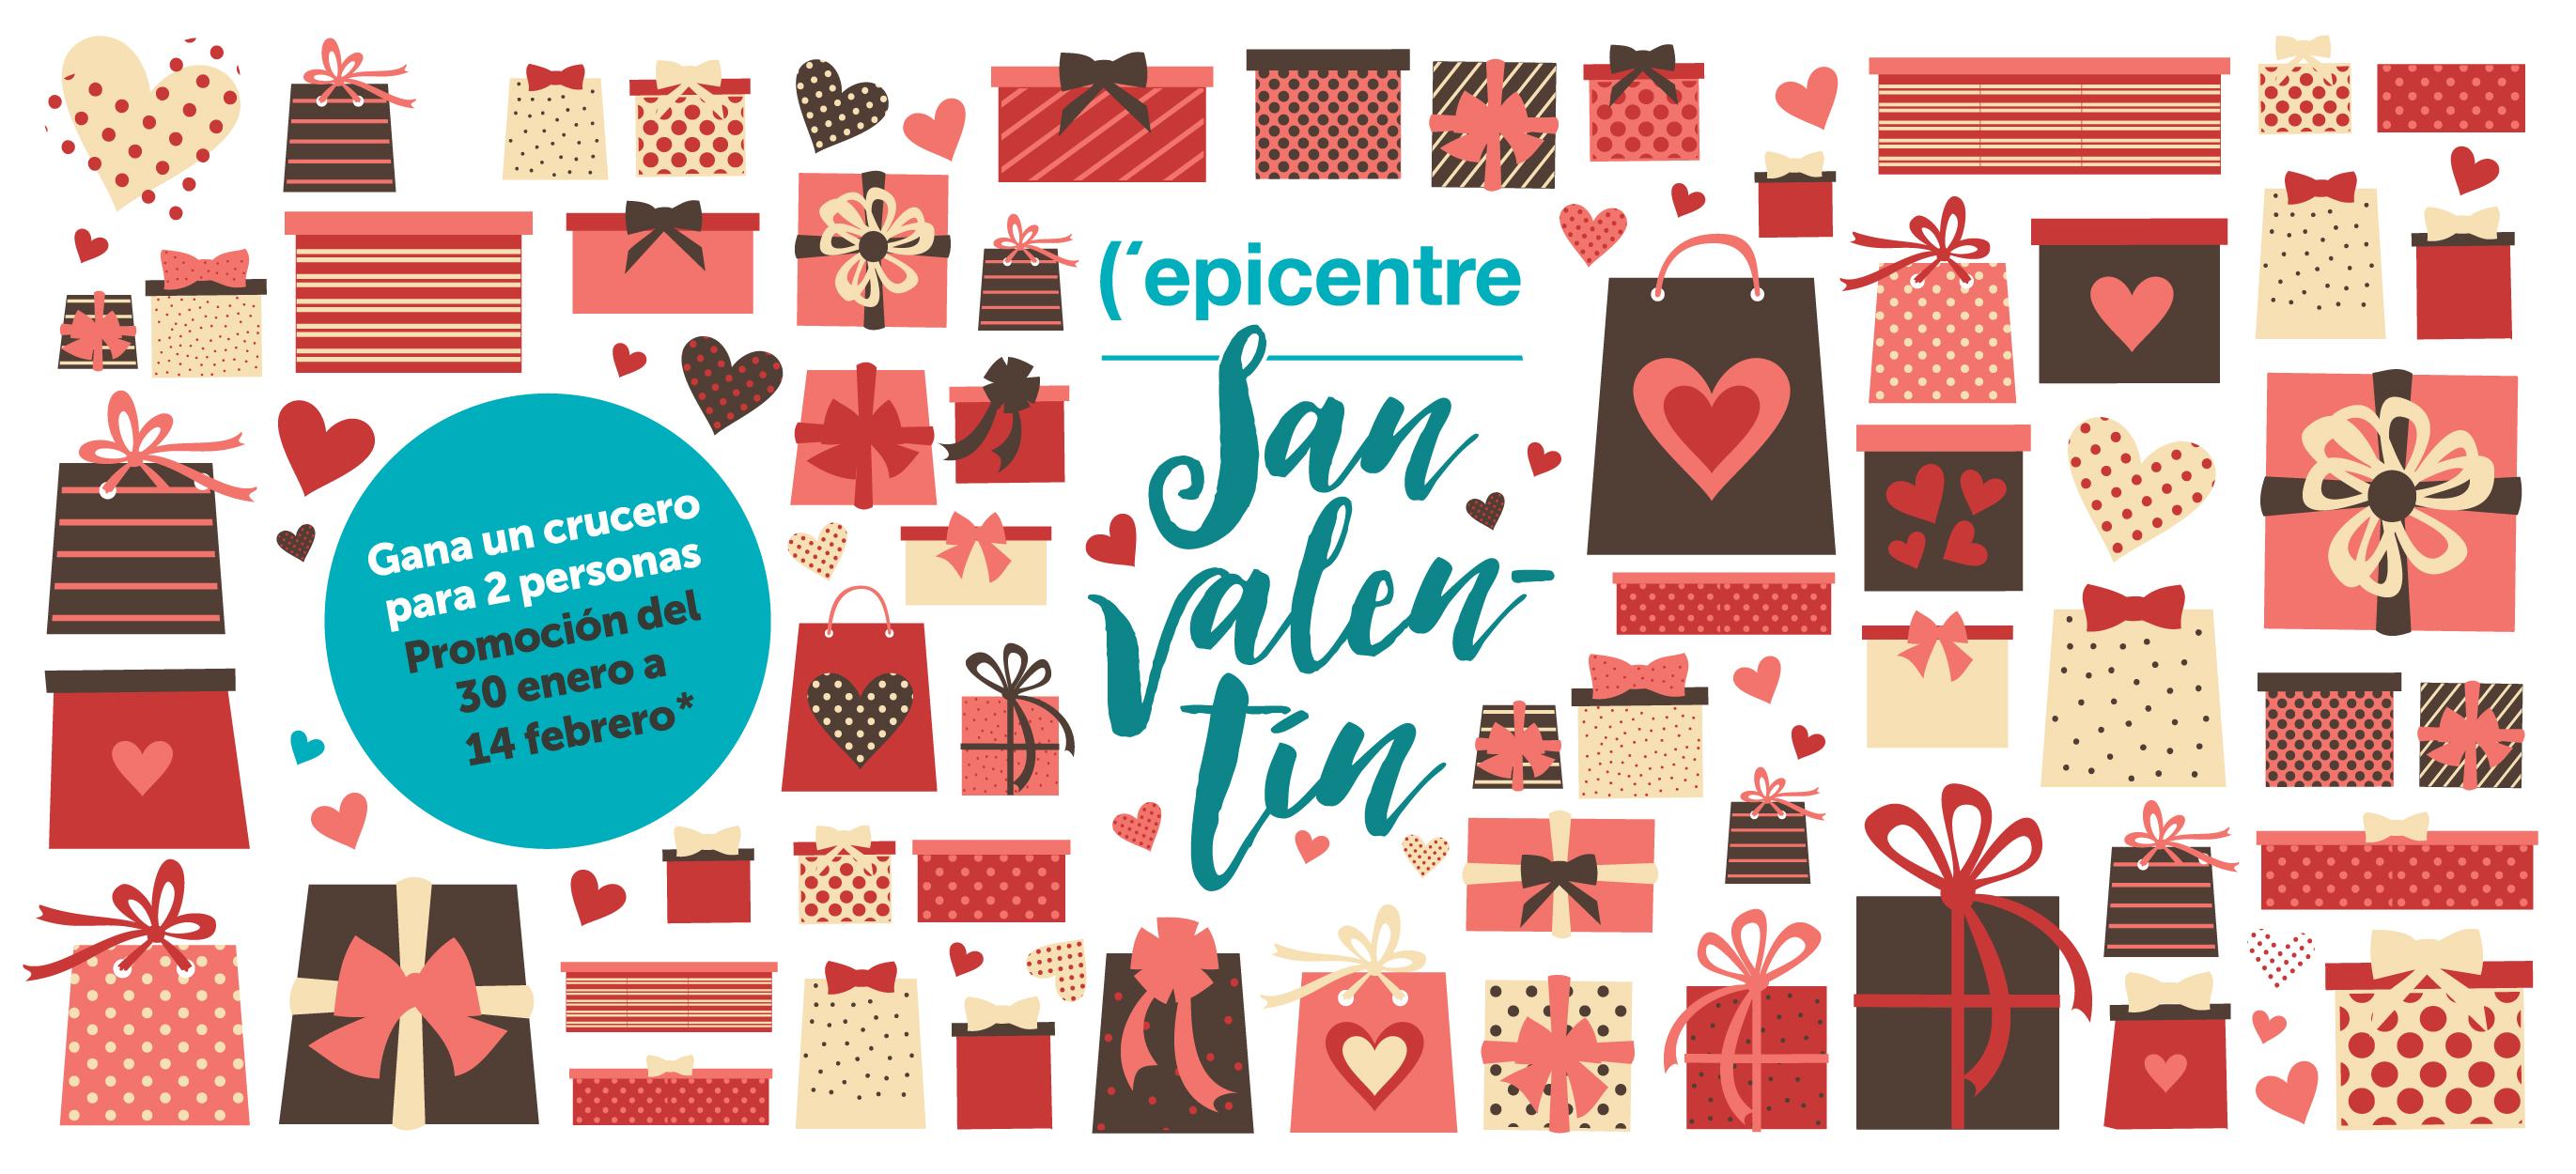 San Valentín 'Vete de Crucero Romántico'